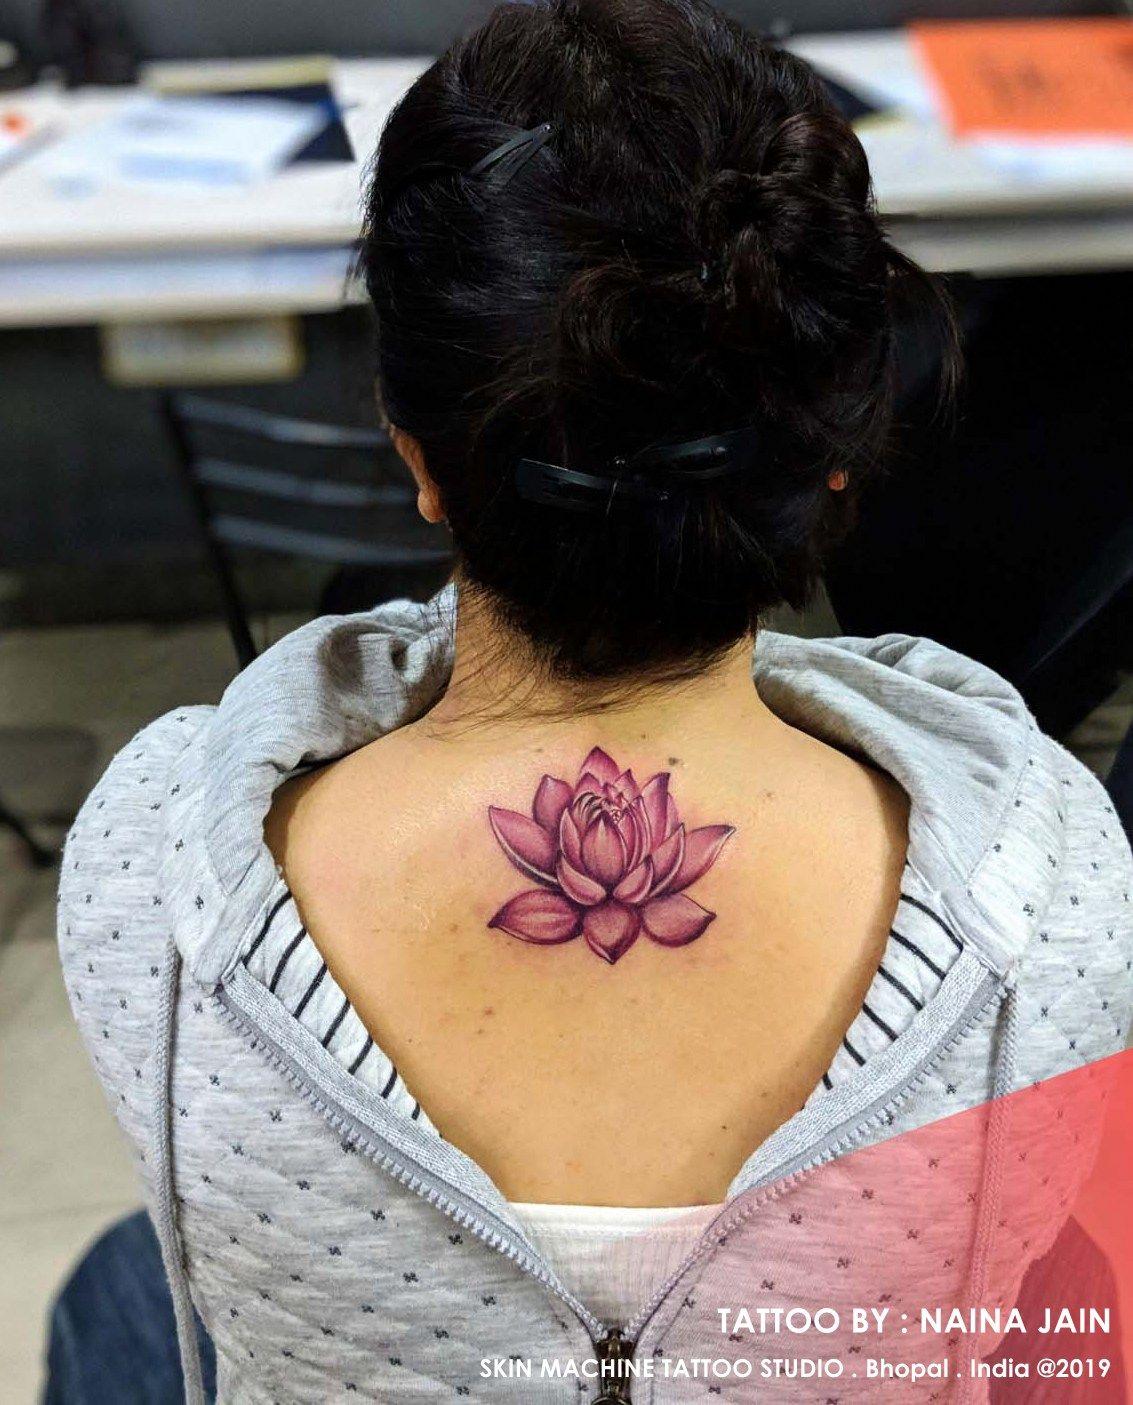 26785537a Beautiful Lotus tattoo by : Naina Jain Skin Machine Tattoo Studio  @skinmachinetattoo Email for appointments : skinmachineteam@gmail.com